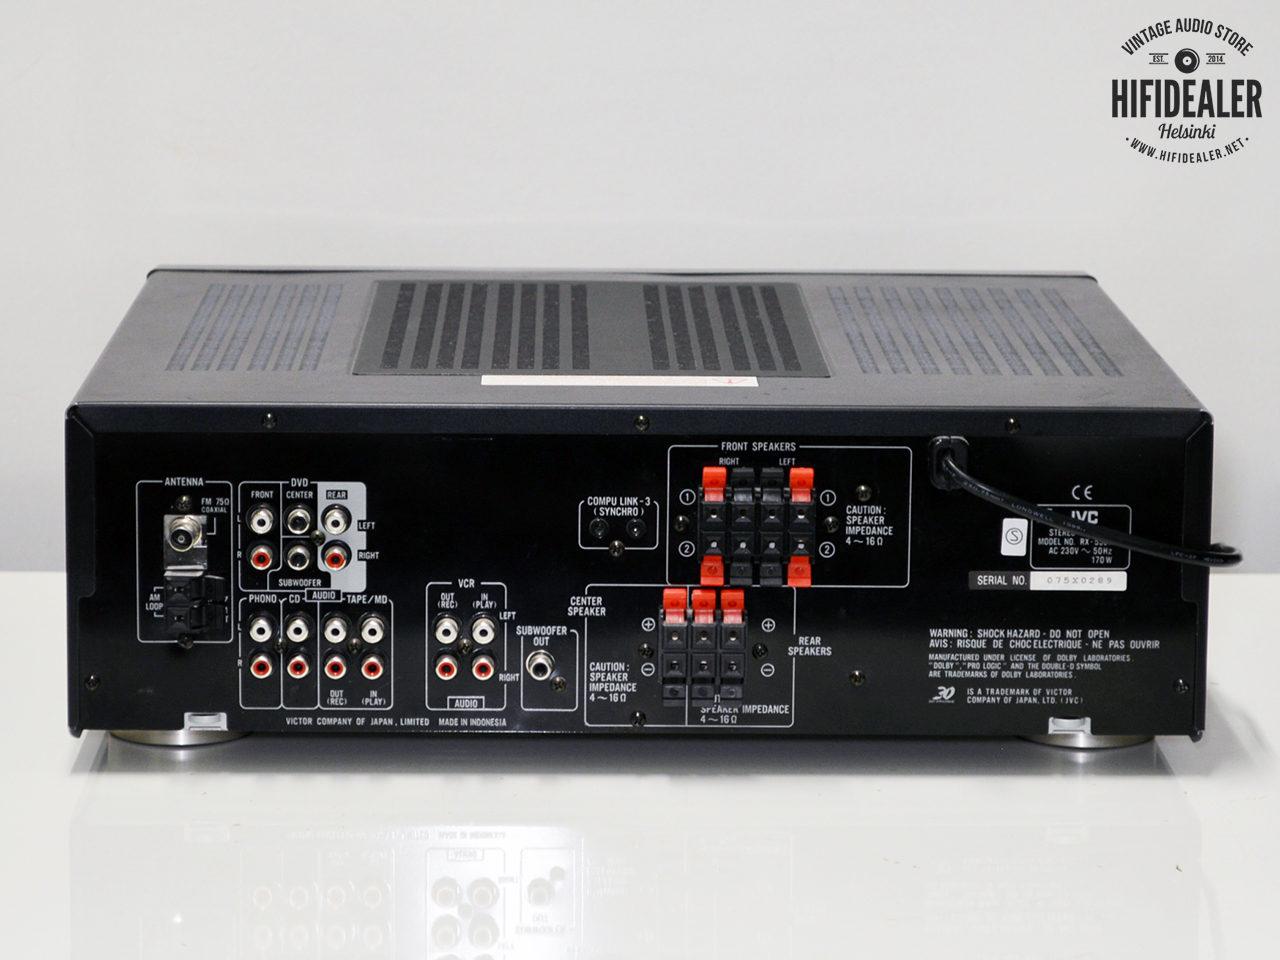 jvc-rx-558r-2